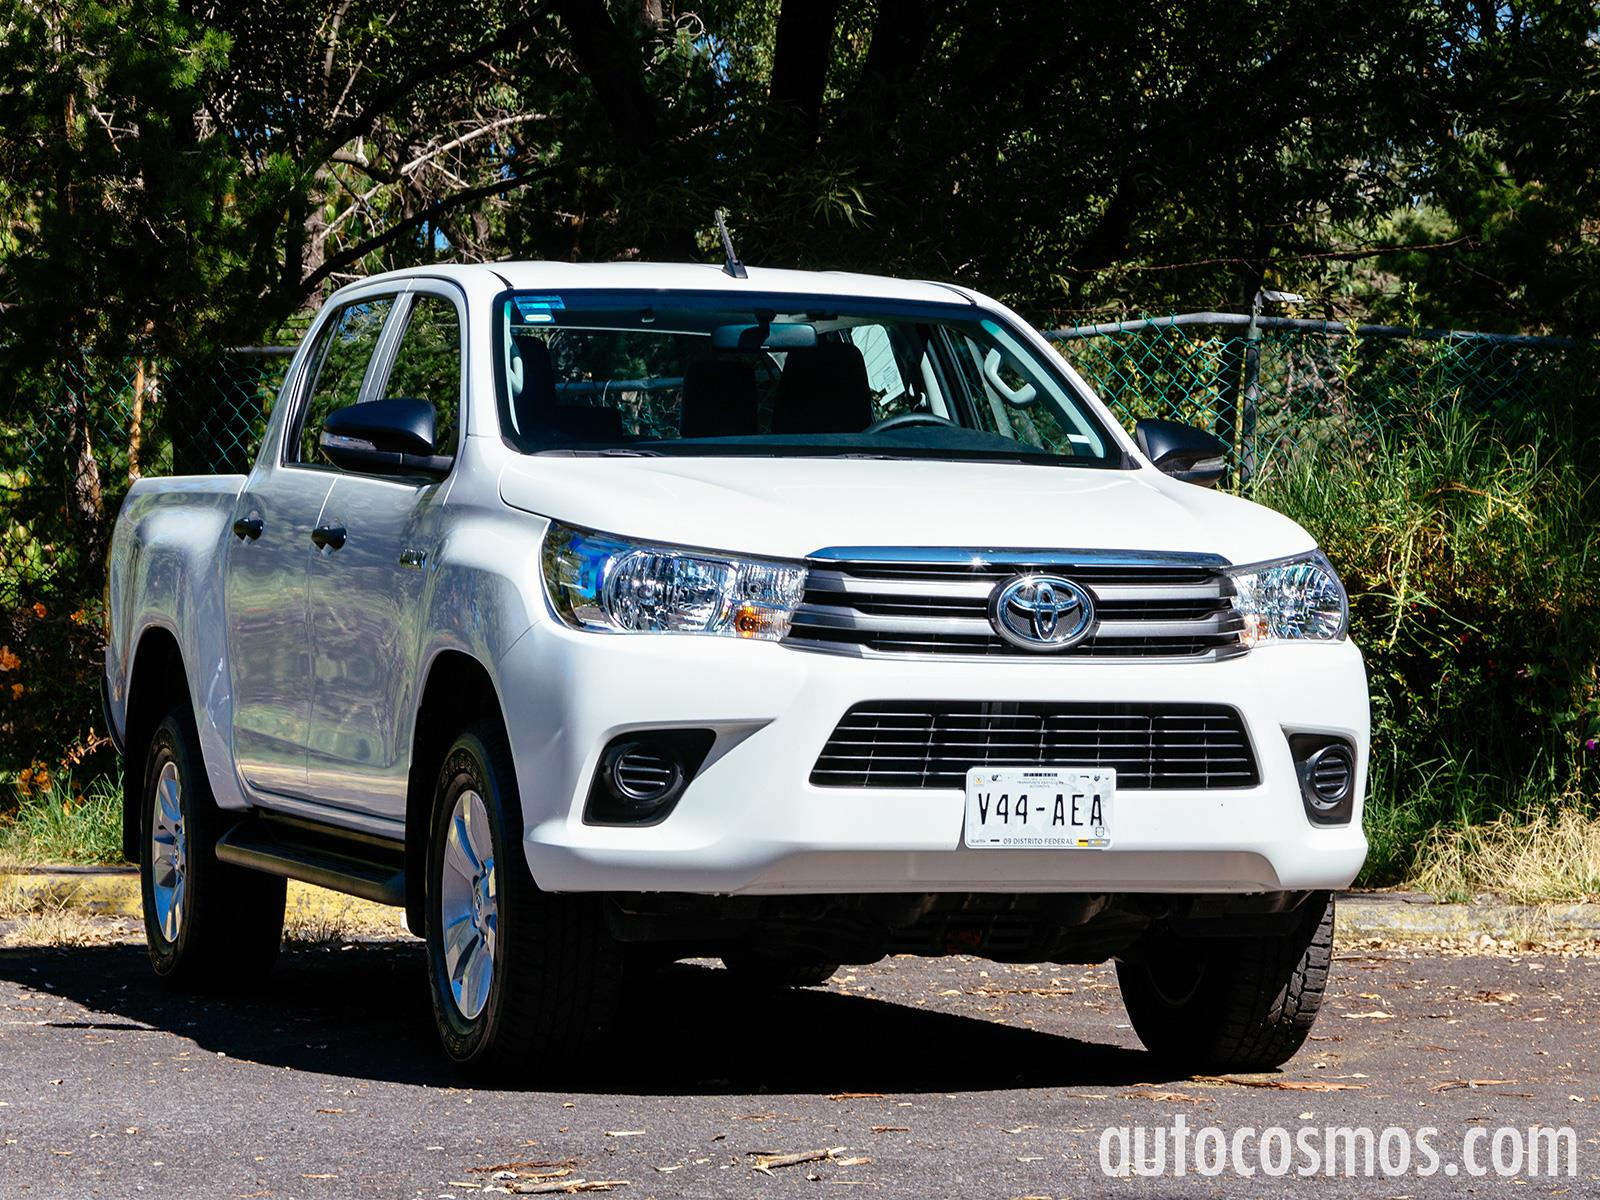 Hilux 2018 Diesel Mexico >> Toyota Hilux 2016 llega a México desde $251,900 pesos - Autocosmos.com